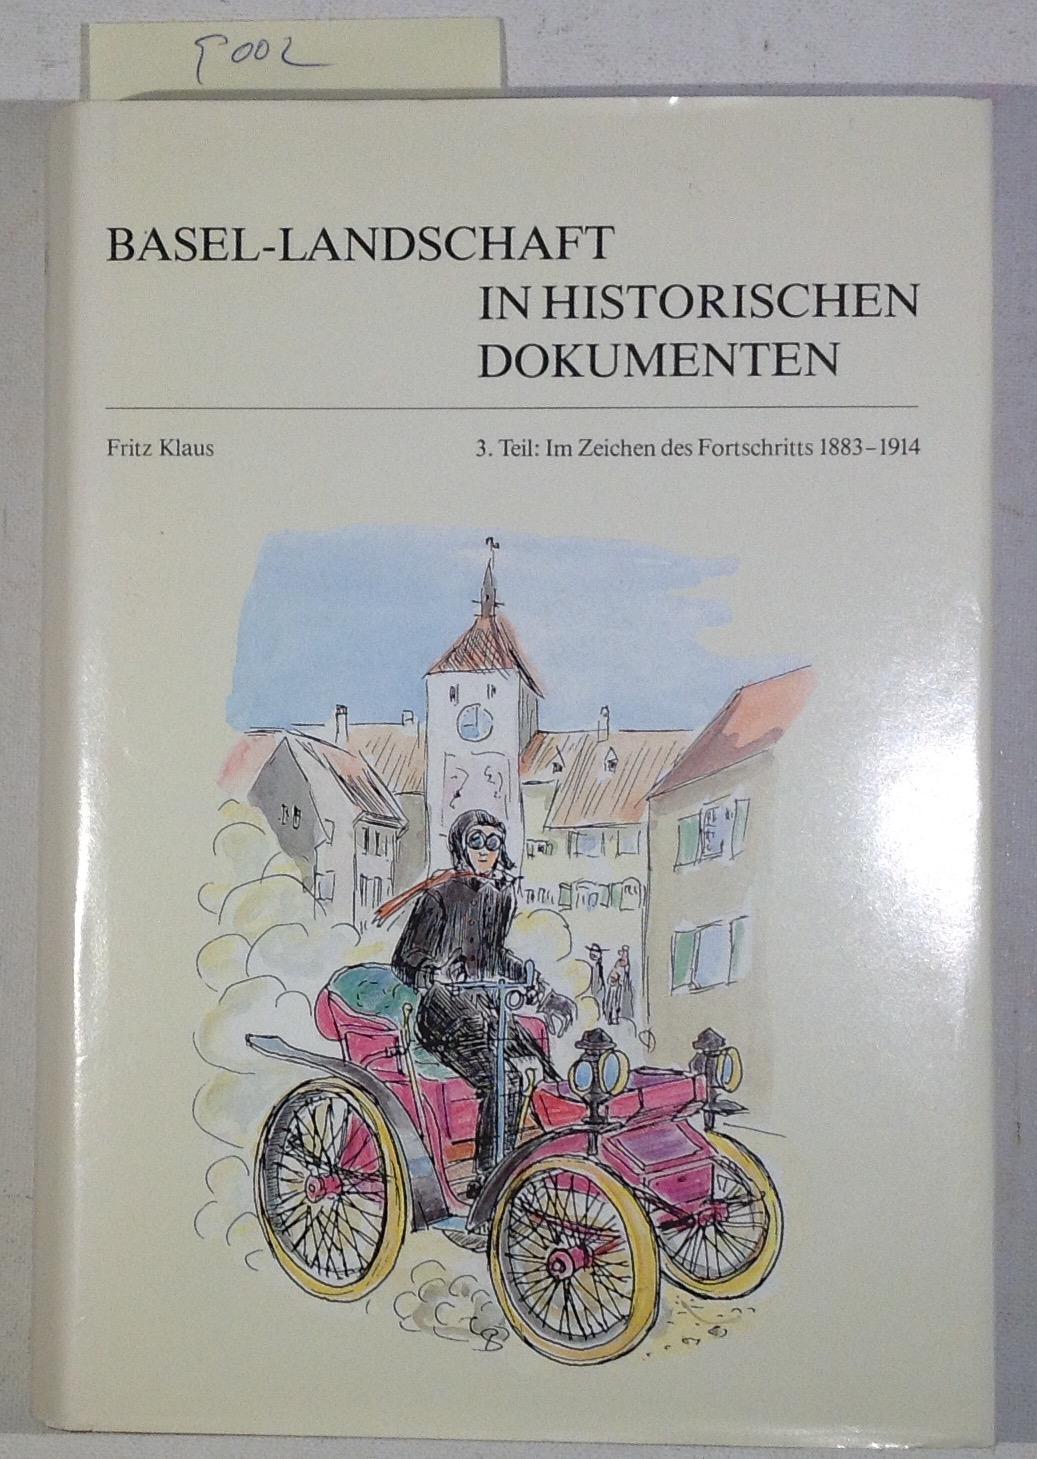 Basel-Landschaft in Historischen Dokumenten 3. Teil : Klaus, Fritz